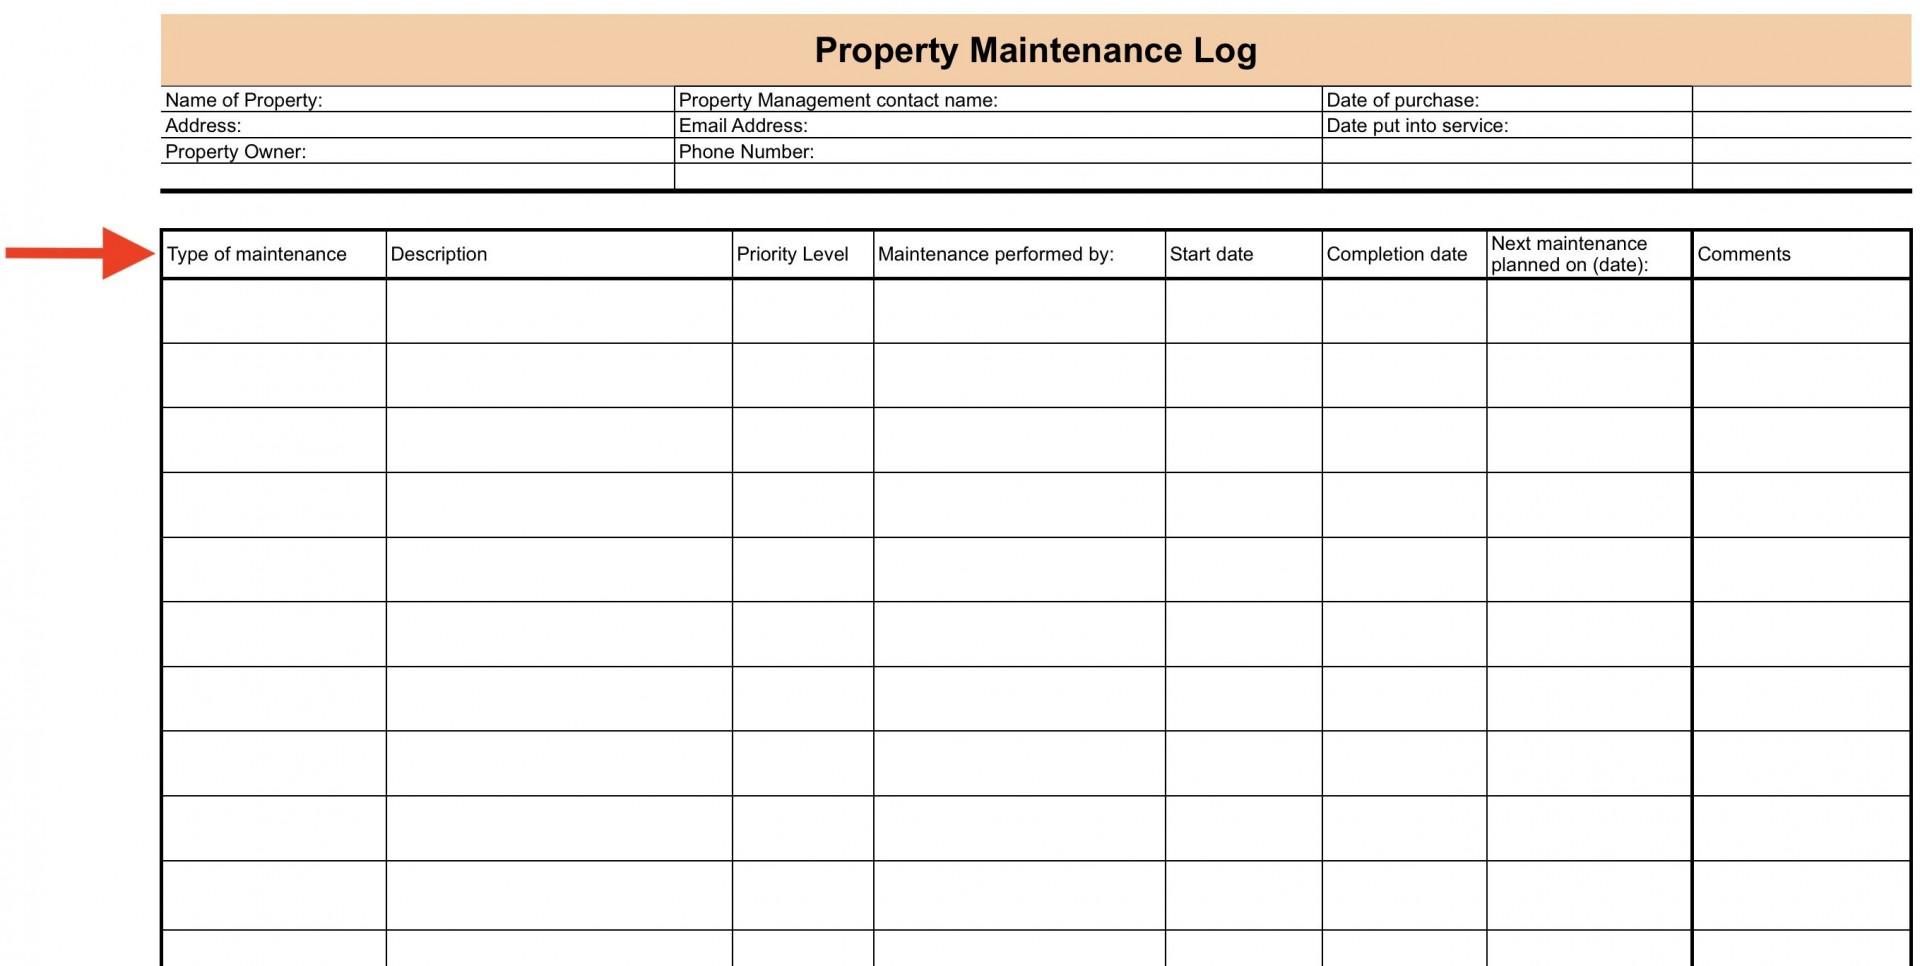 008 Surprising Property Management Maintenance Checklist Template Sample  Free1920